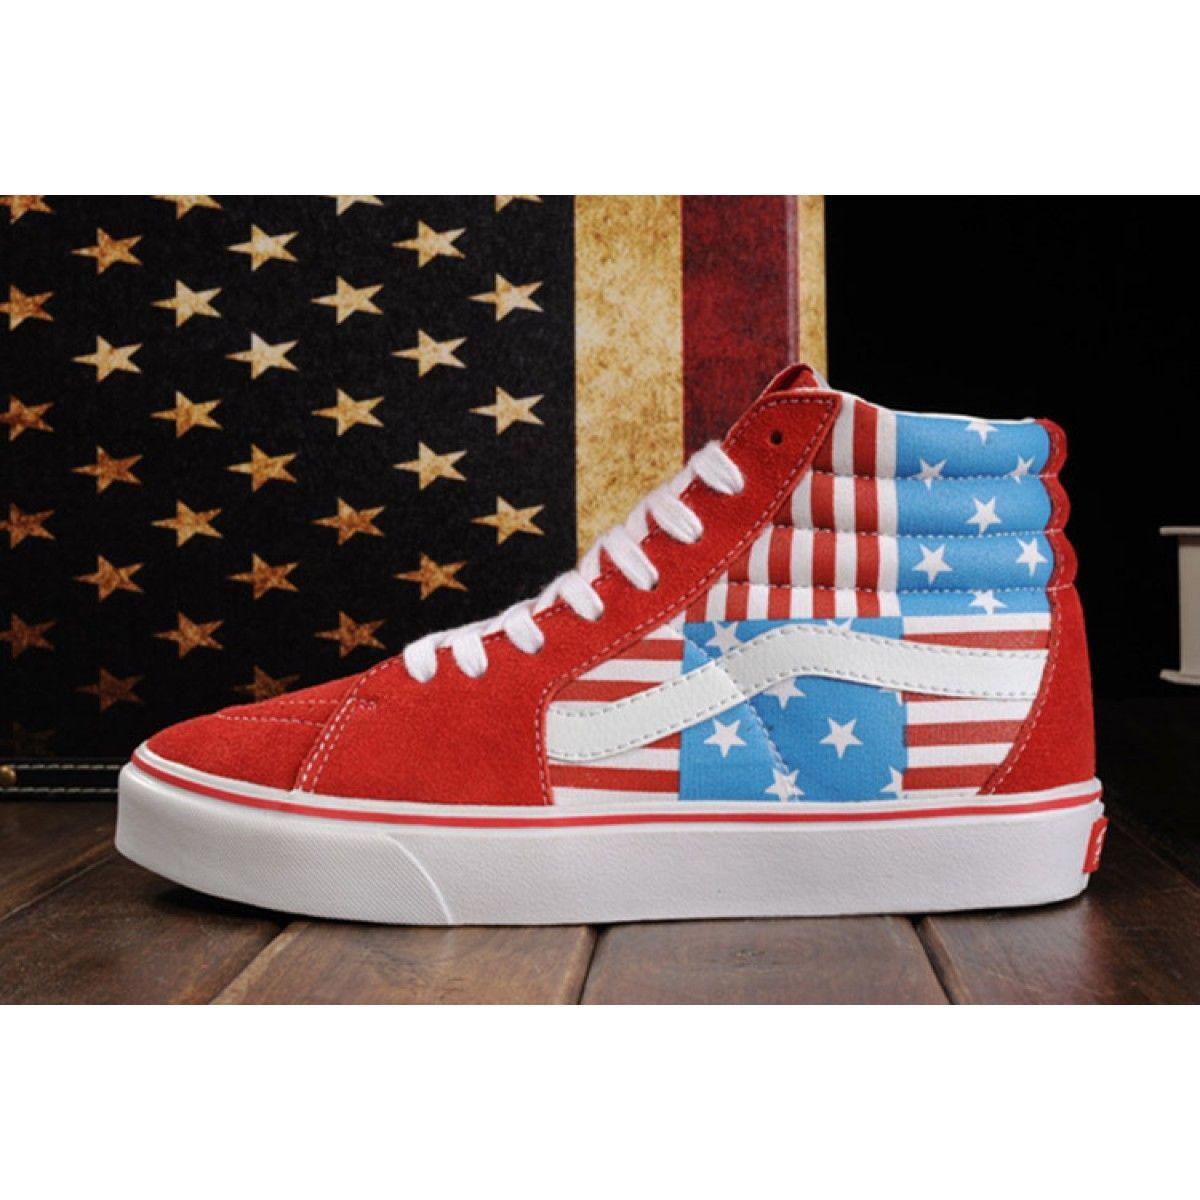 618a1eb8cc0a Limited Edition Red Vans American FLag Beckham SK8 Hi Skateboard Shoes  Vans